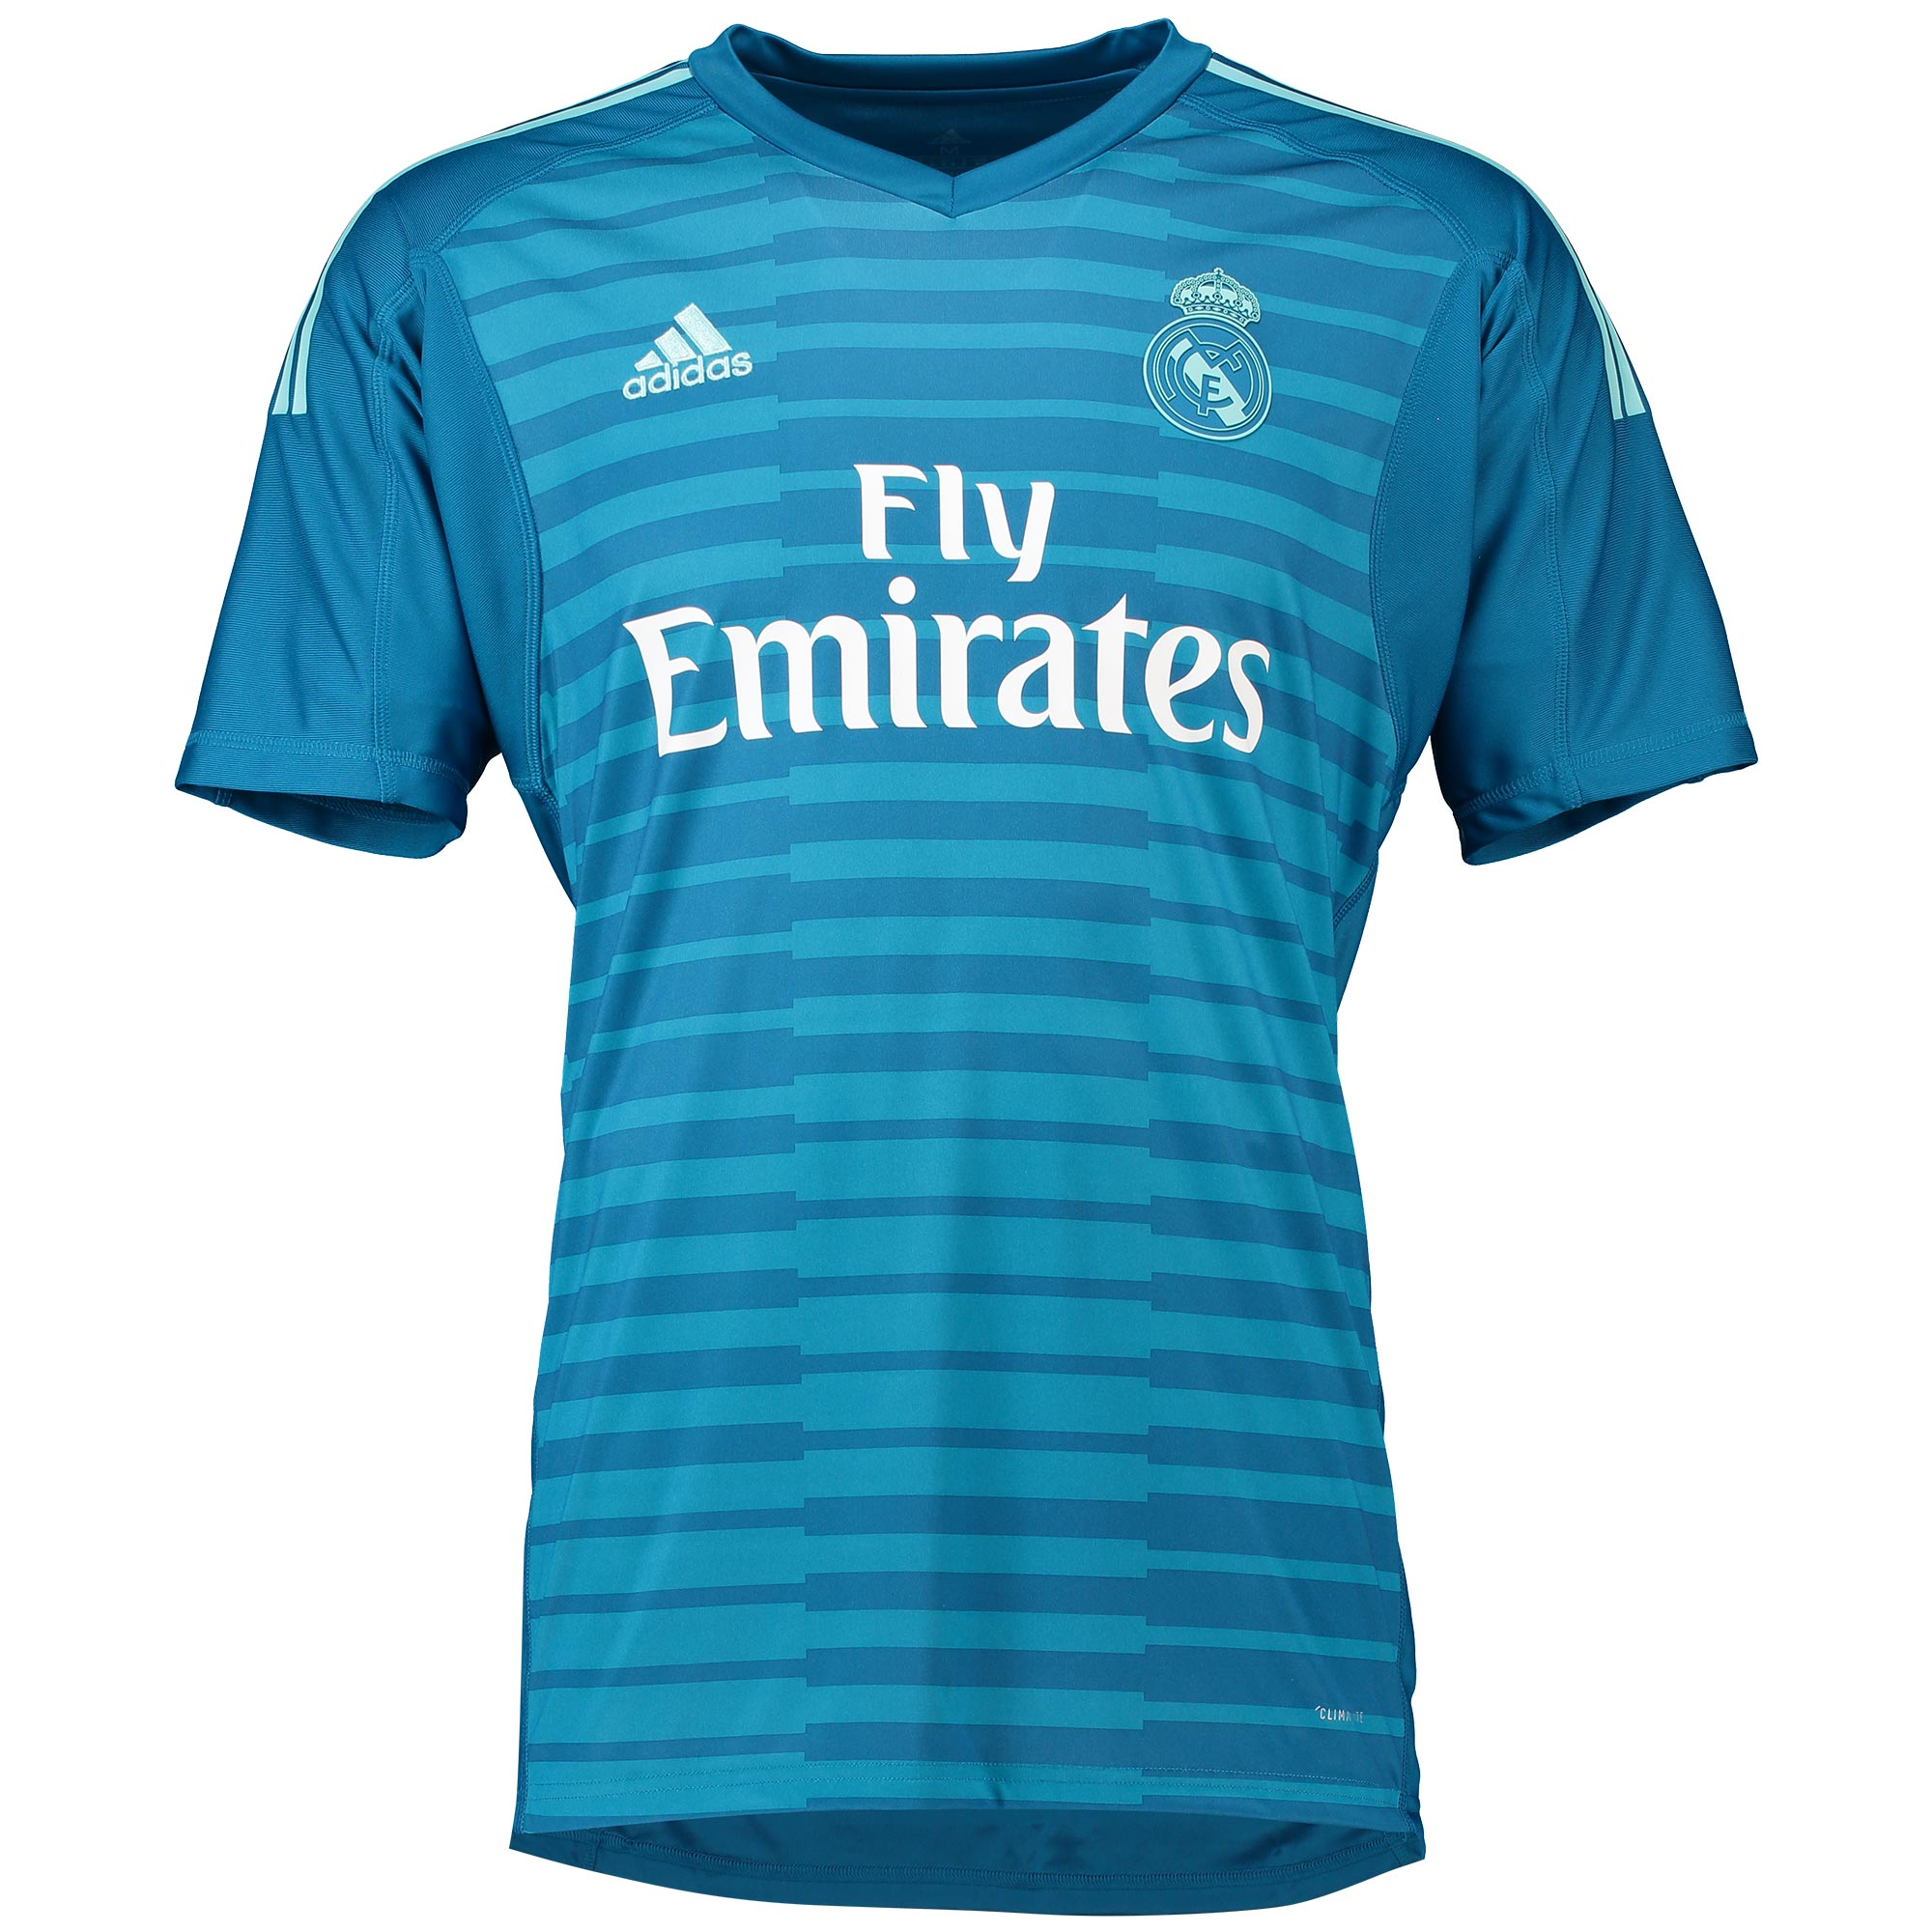 9f838caa3c Oficial Real Madrid Segunda Portero Camisa 2018-19 Hombre adidas ...